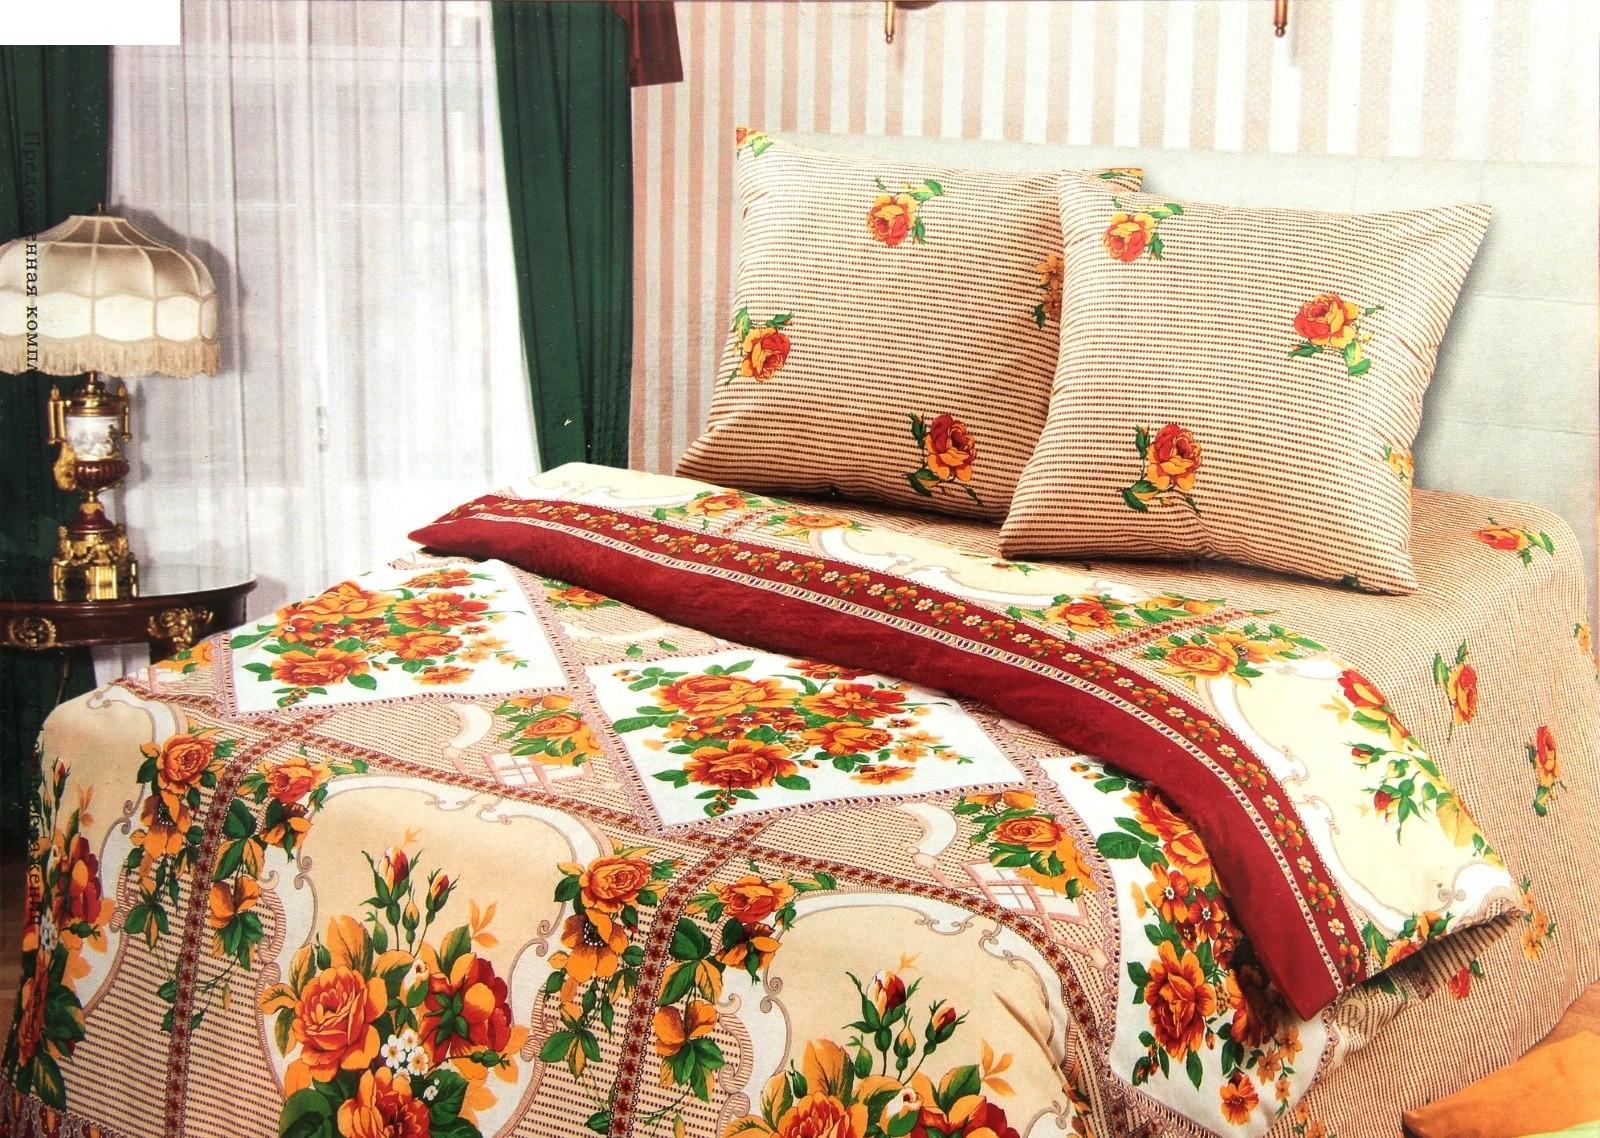 Продажа Ивановского текстиля